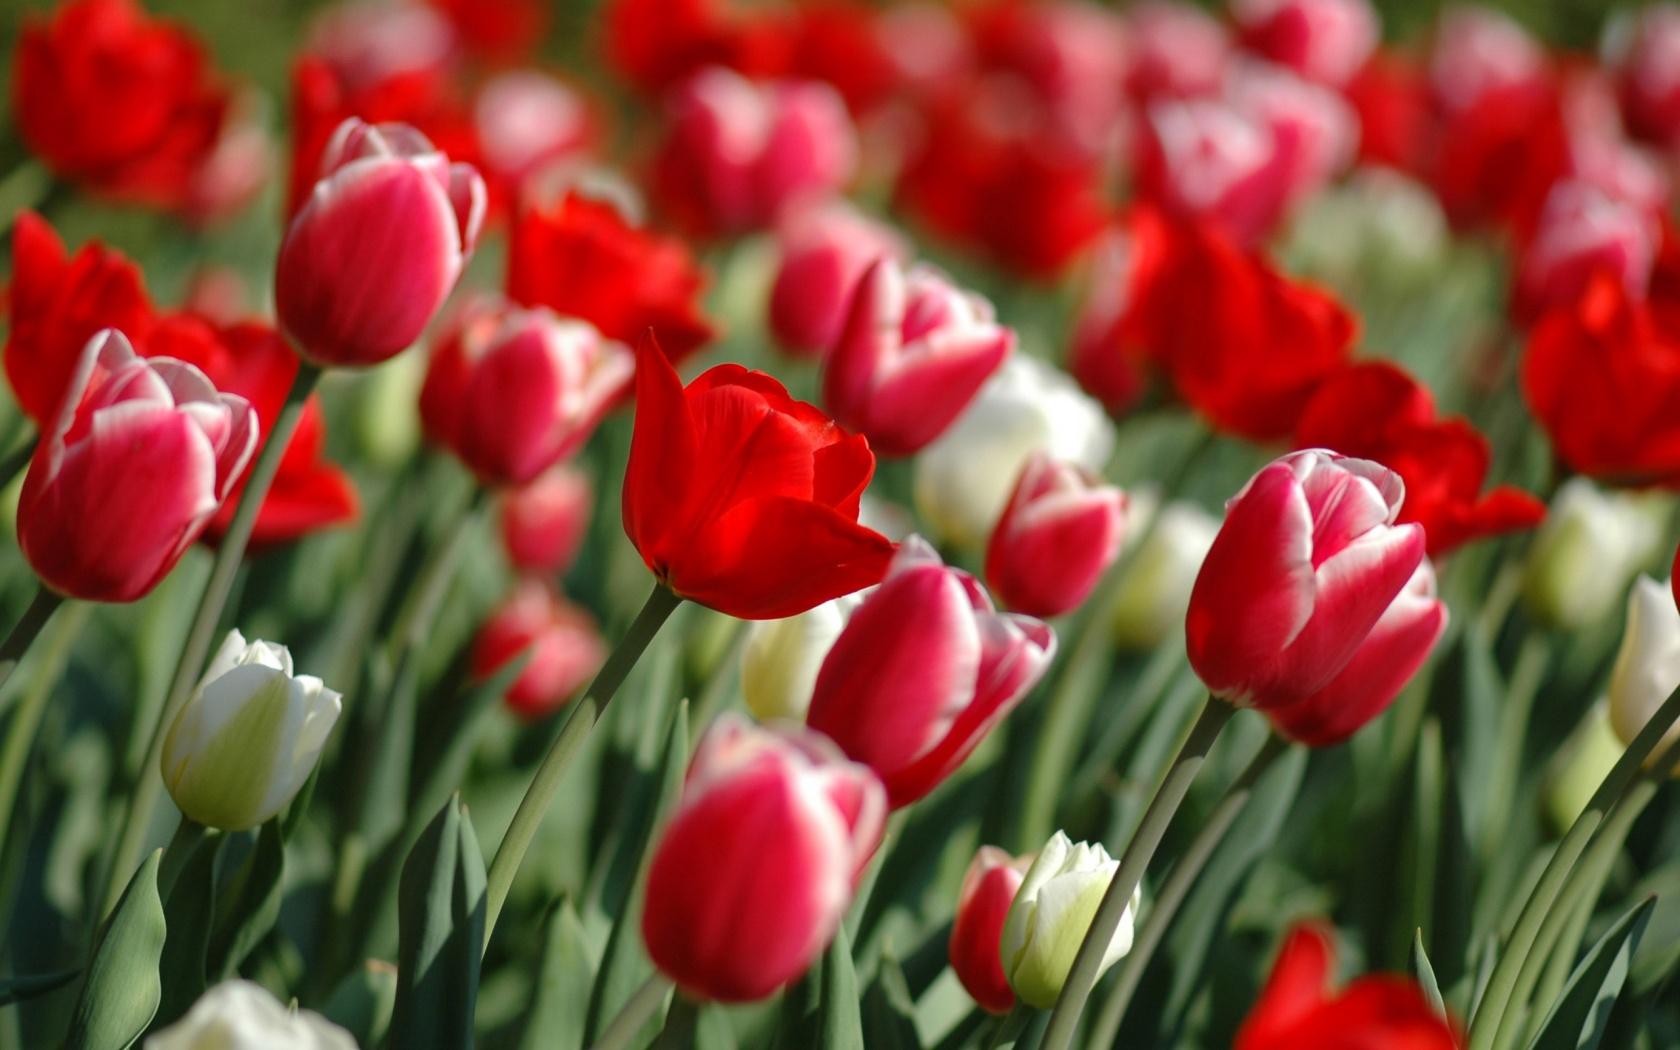 Wallpapers screen savers flowers tulips download screensavers spring